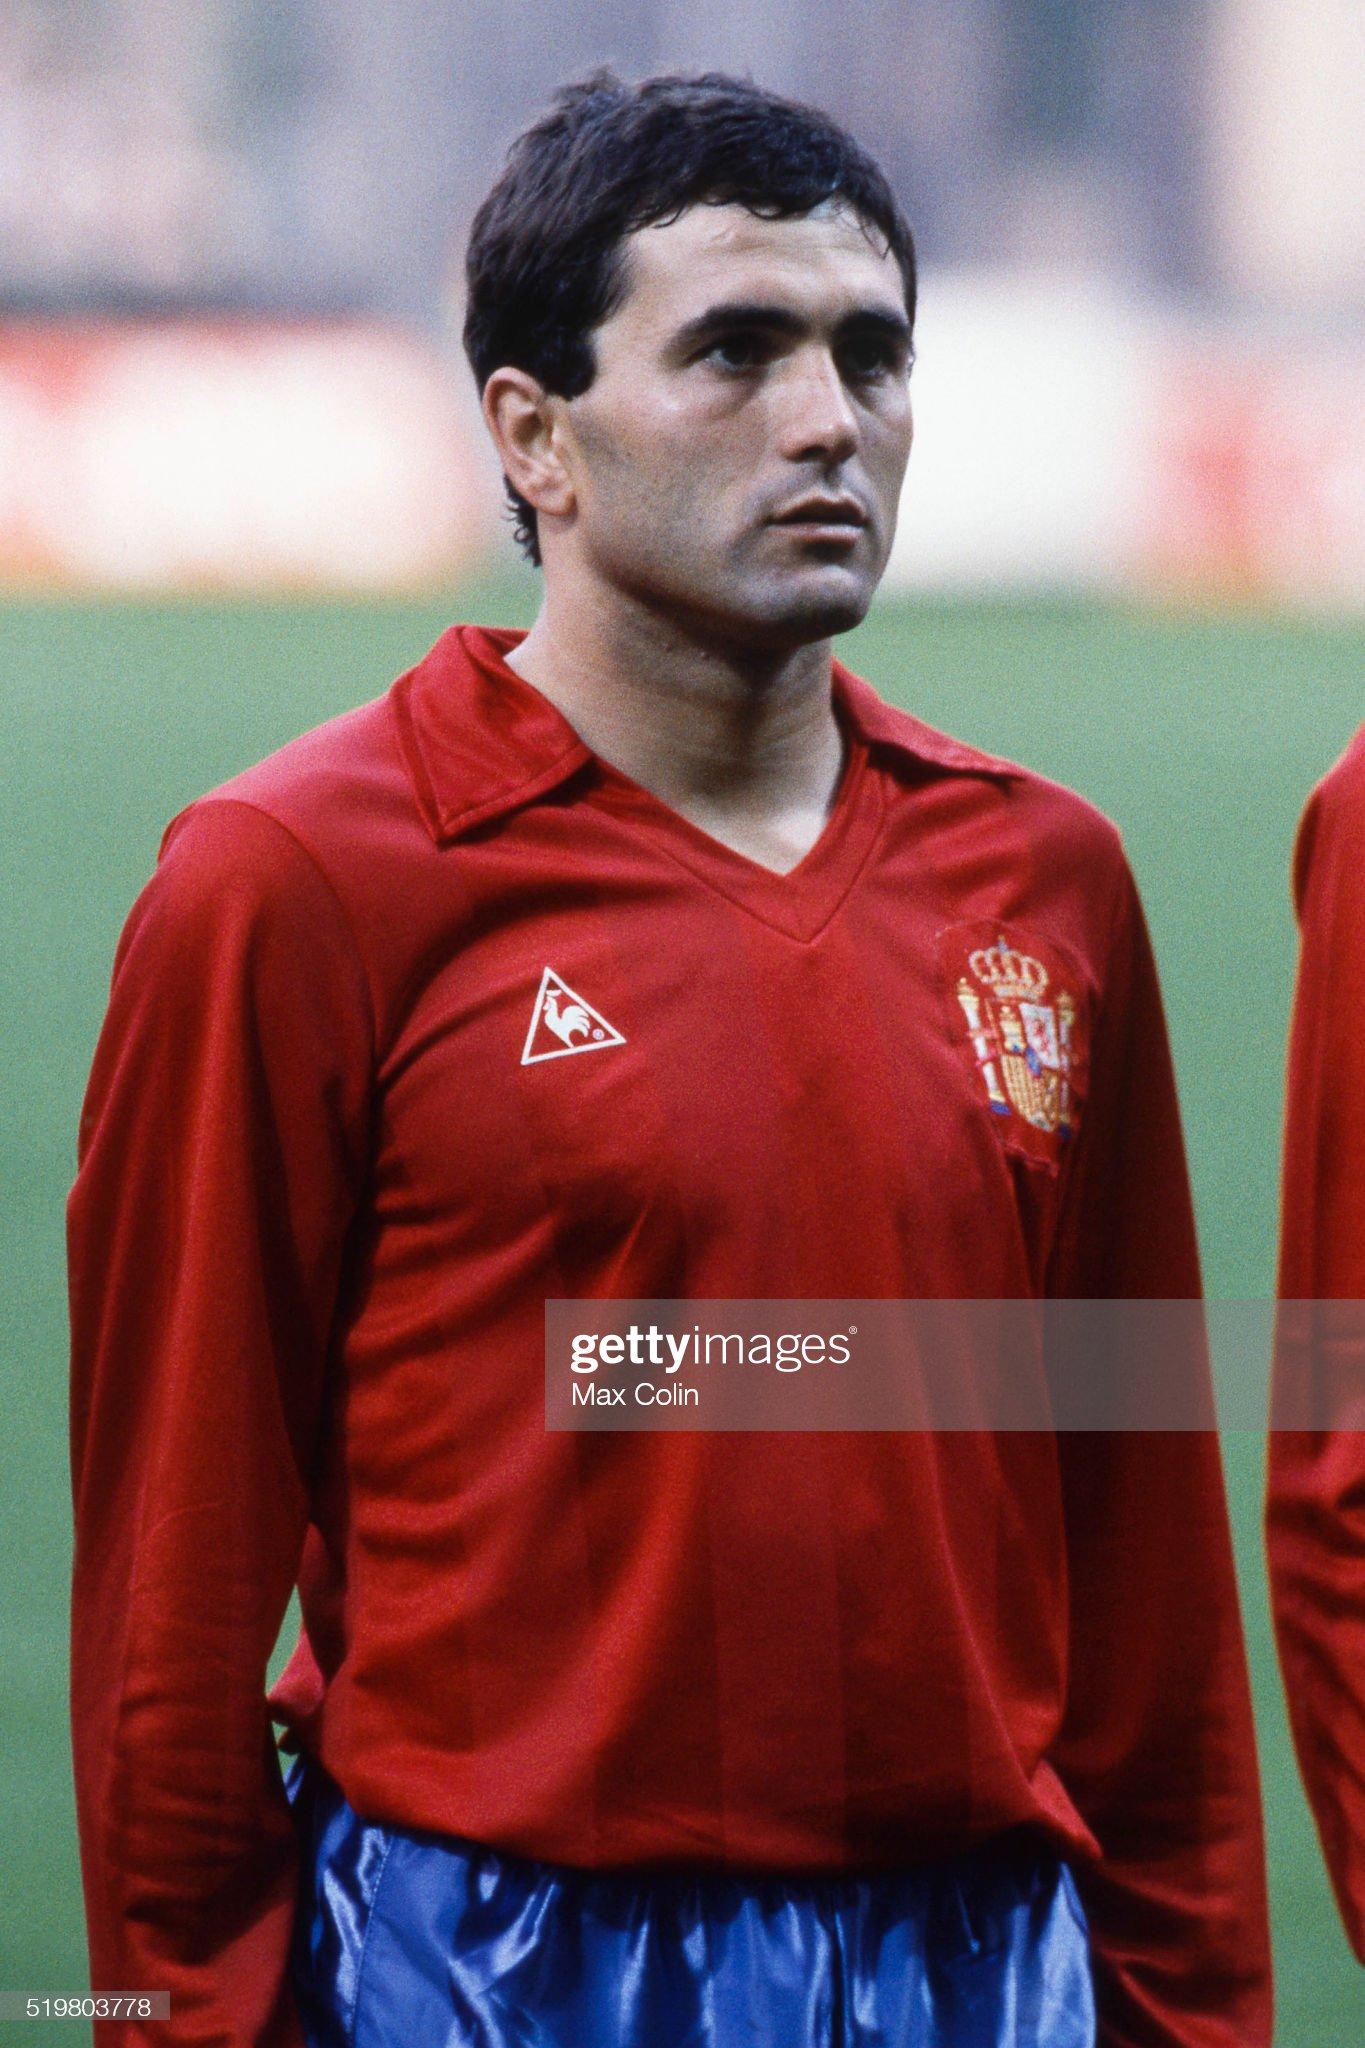 ¿Cuánto mide Rafael Gordillo? - Altura Rafael-gordillo-during-the-football-european-championship-between-picture-id519803778?s=2048x2048